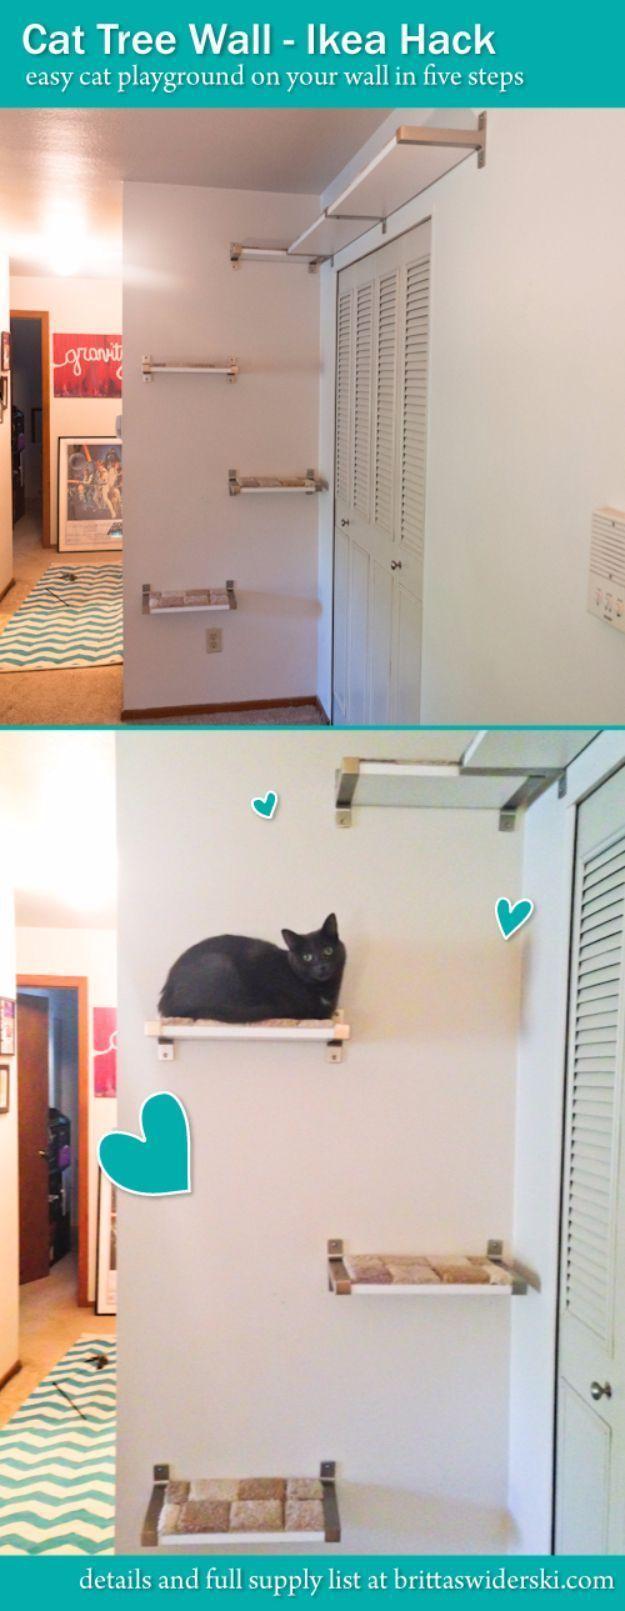 DIY Cat Hacks - Cat Tree Wall Ikea Hack - Tips and Tricks - 5 Easy Steps - Cat Wall Shelves